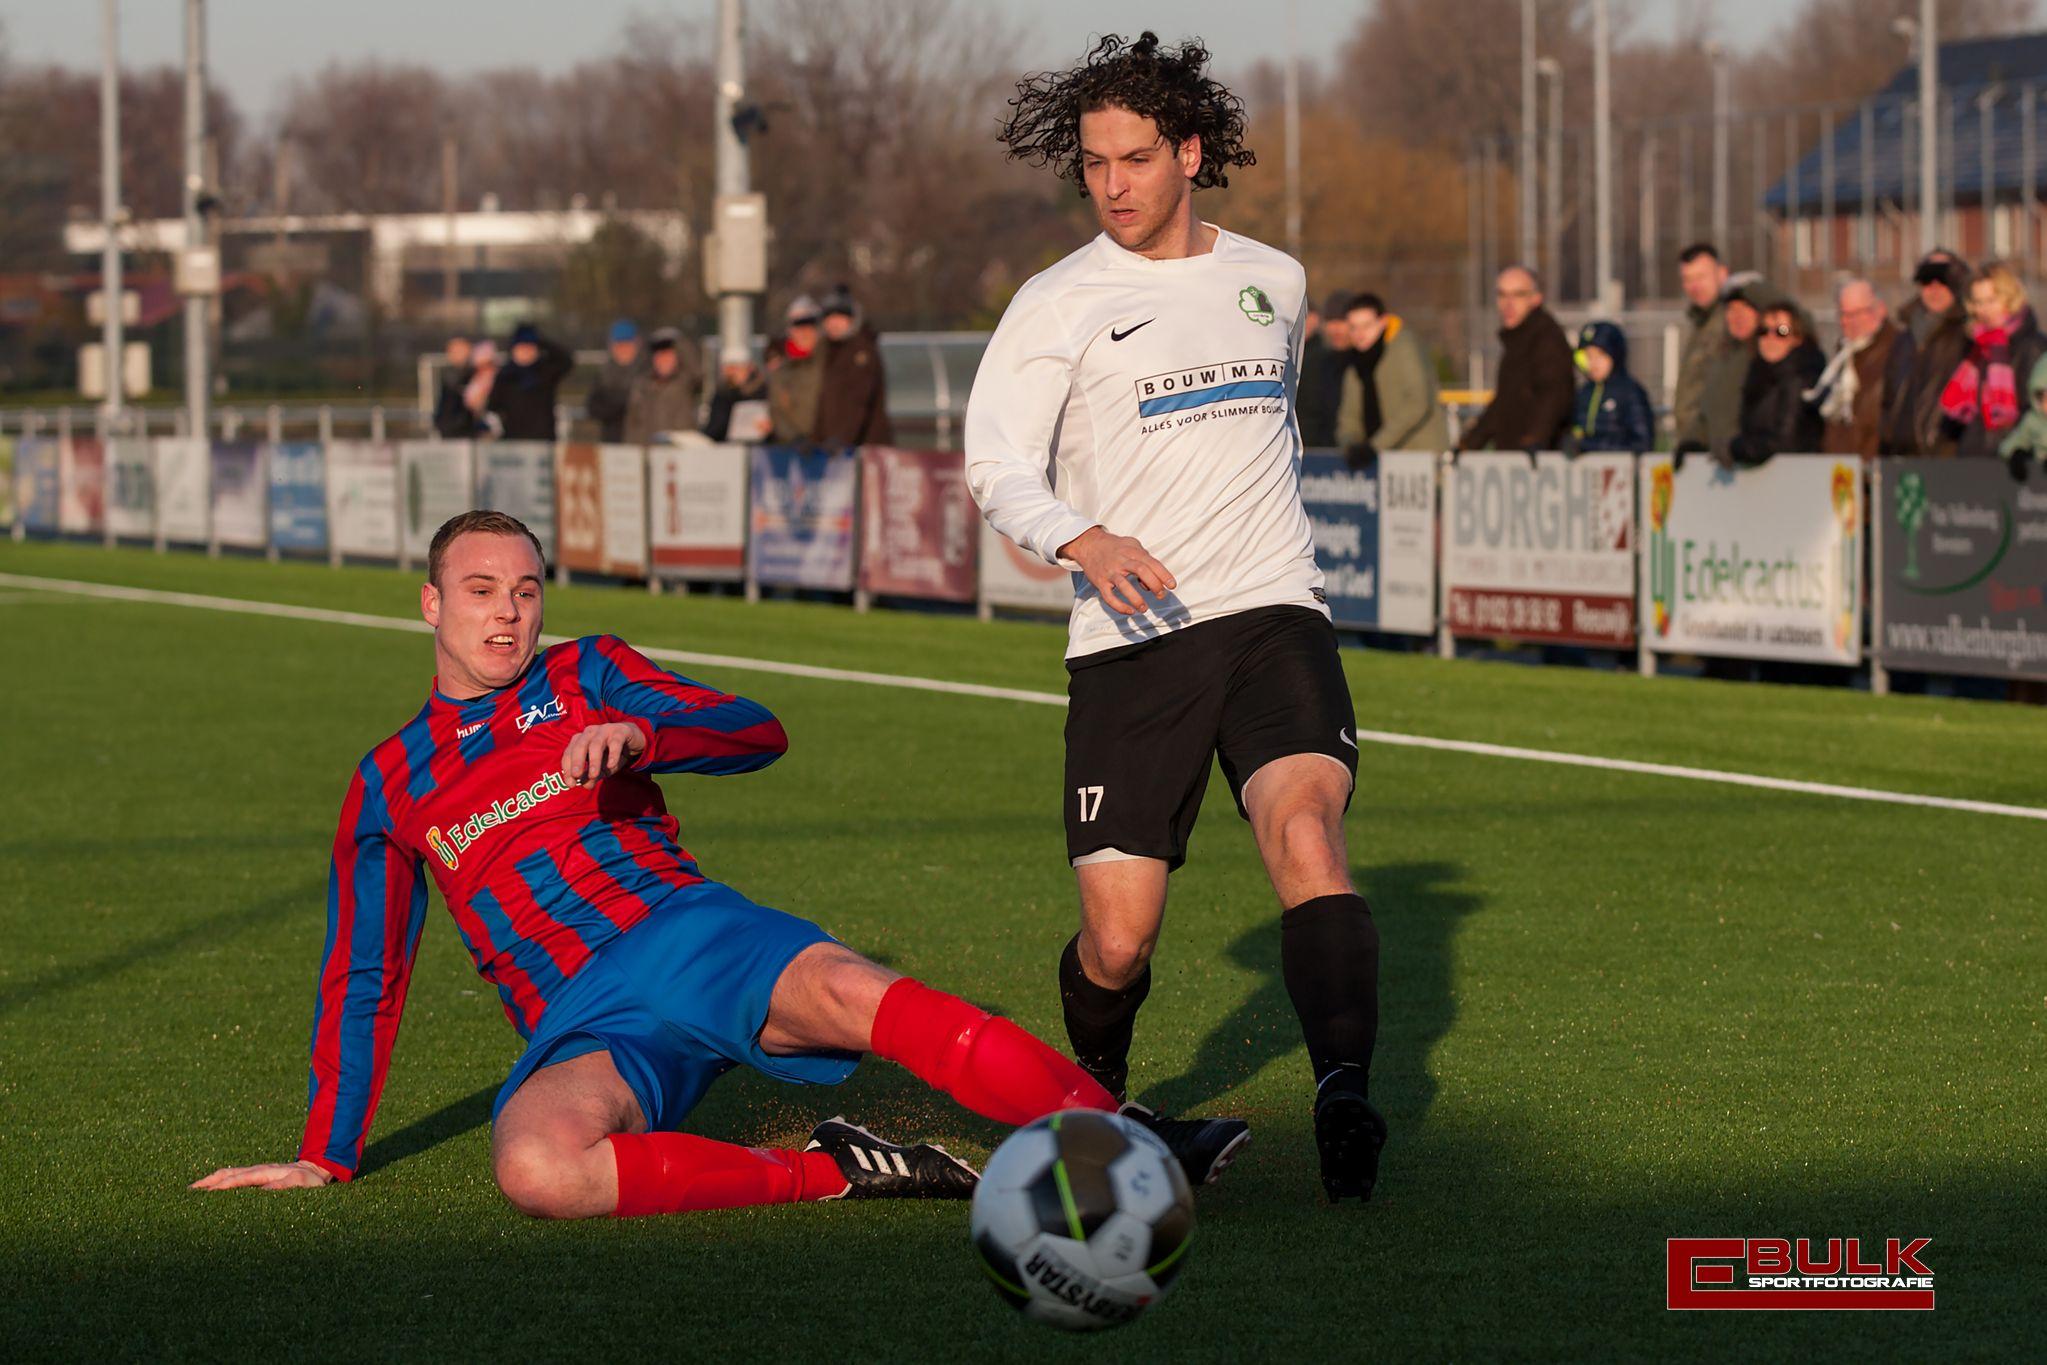 ebs_0154-ed_bulk_sportfotografie